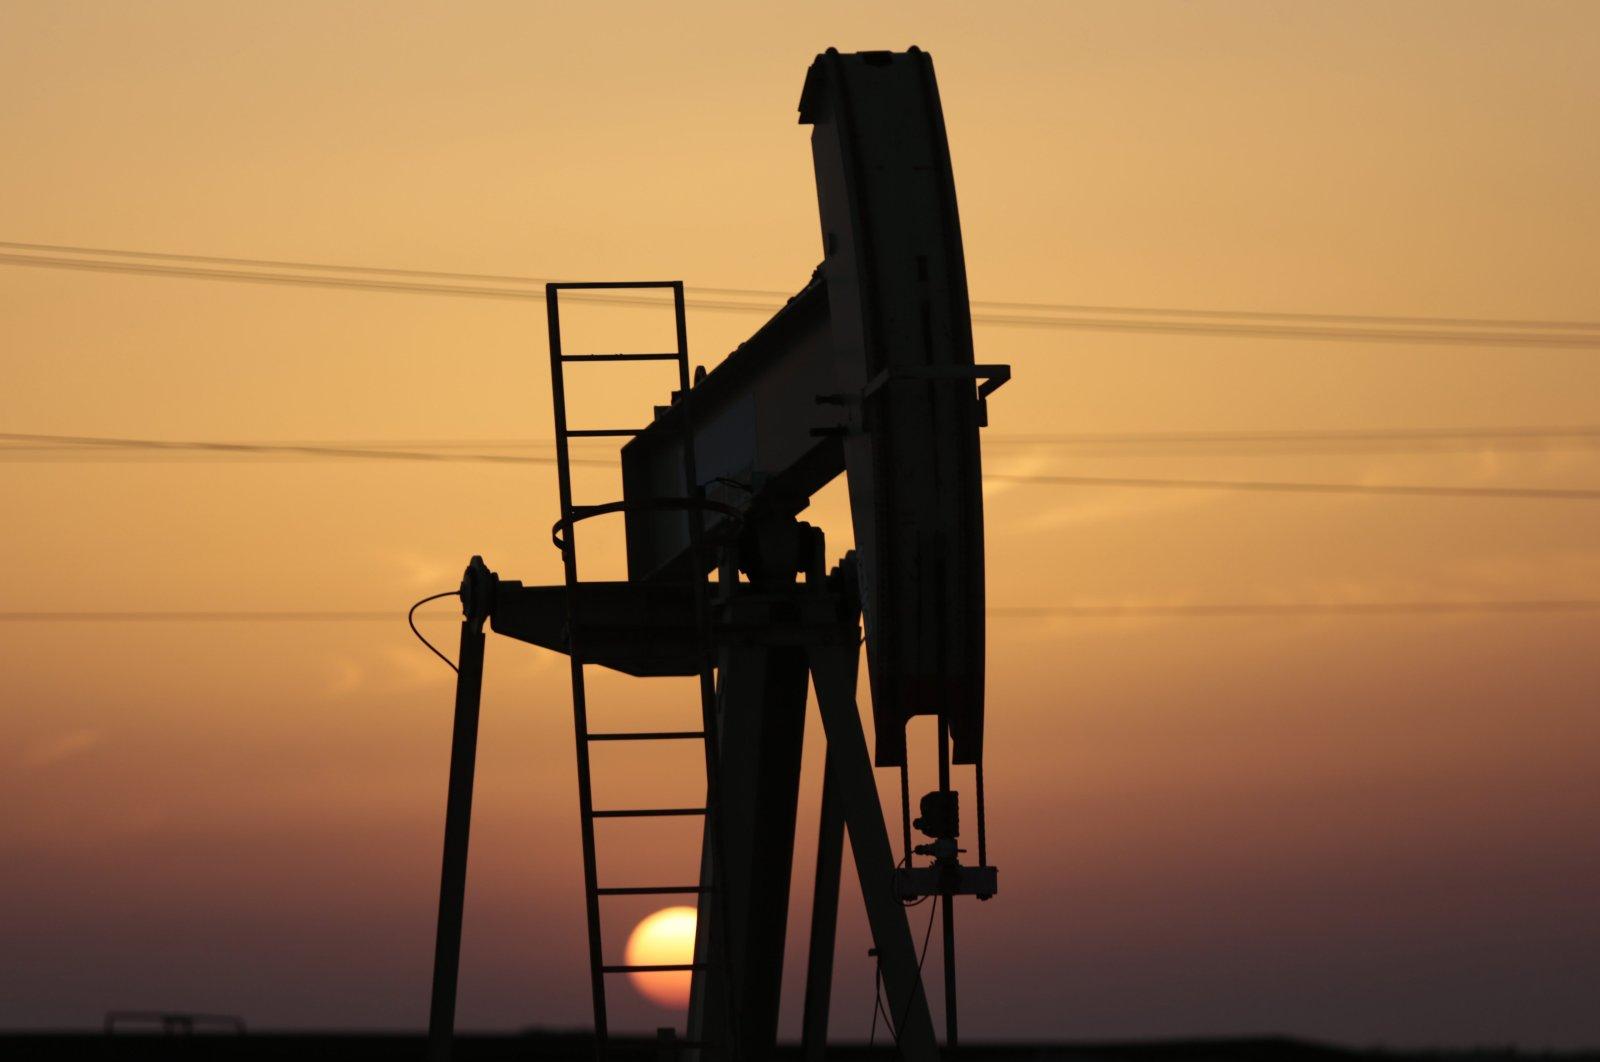 An oil pump works at sunset in the desert oil fields of Sakhir, Bahrain, April 16, 2016. (AP Photo)